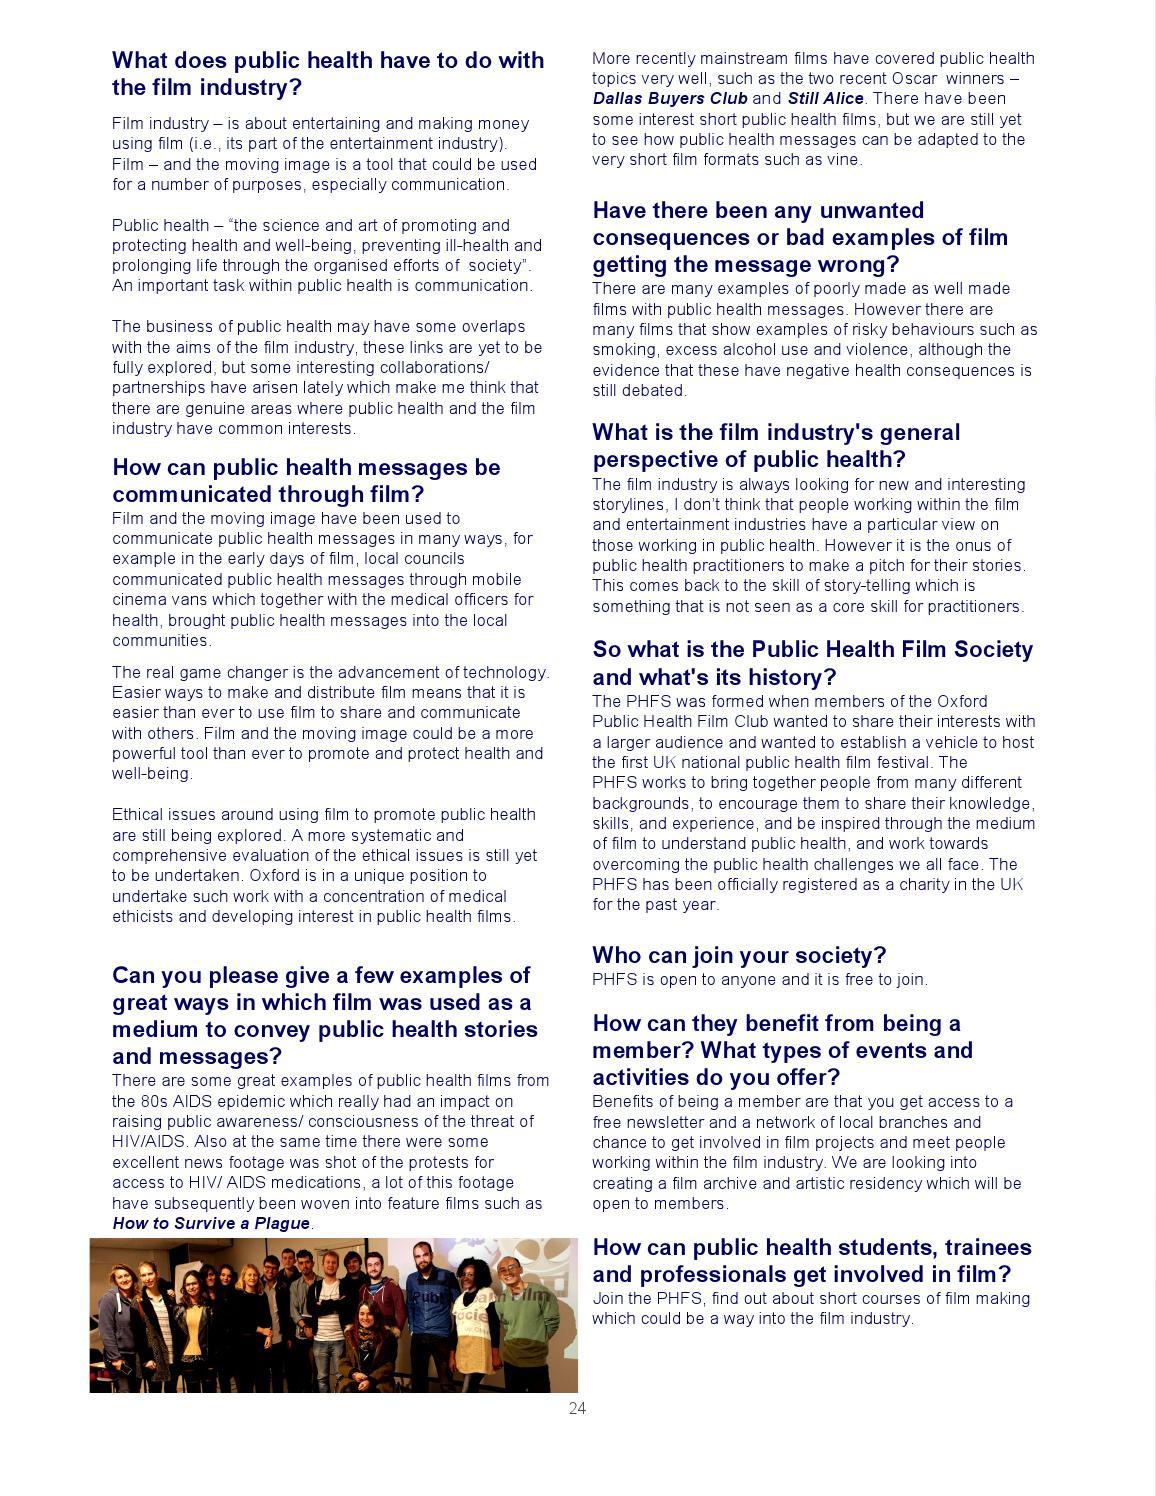 Oxford Public Health Magazine - Issue 1 by Oxford Public